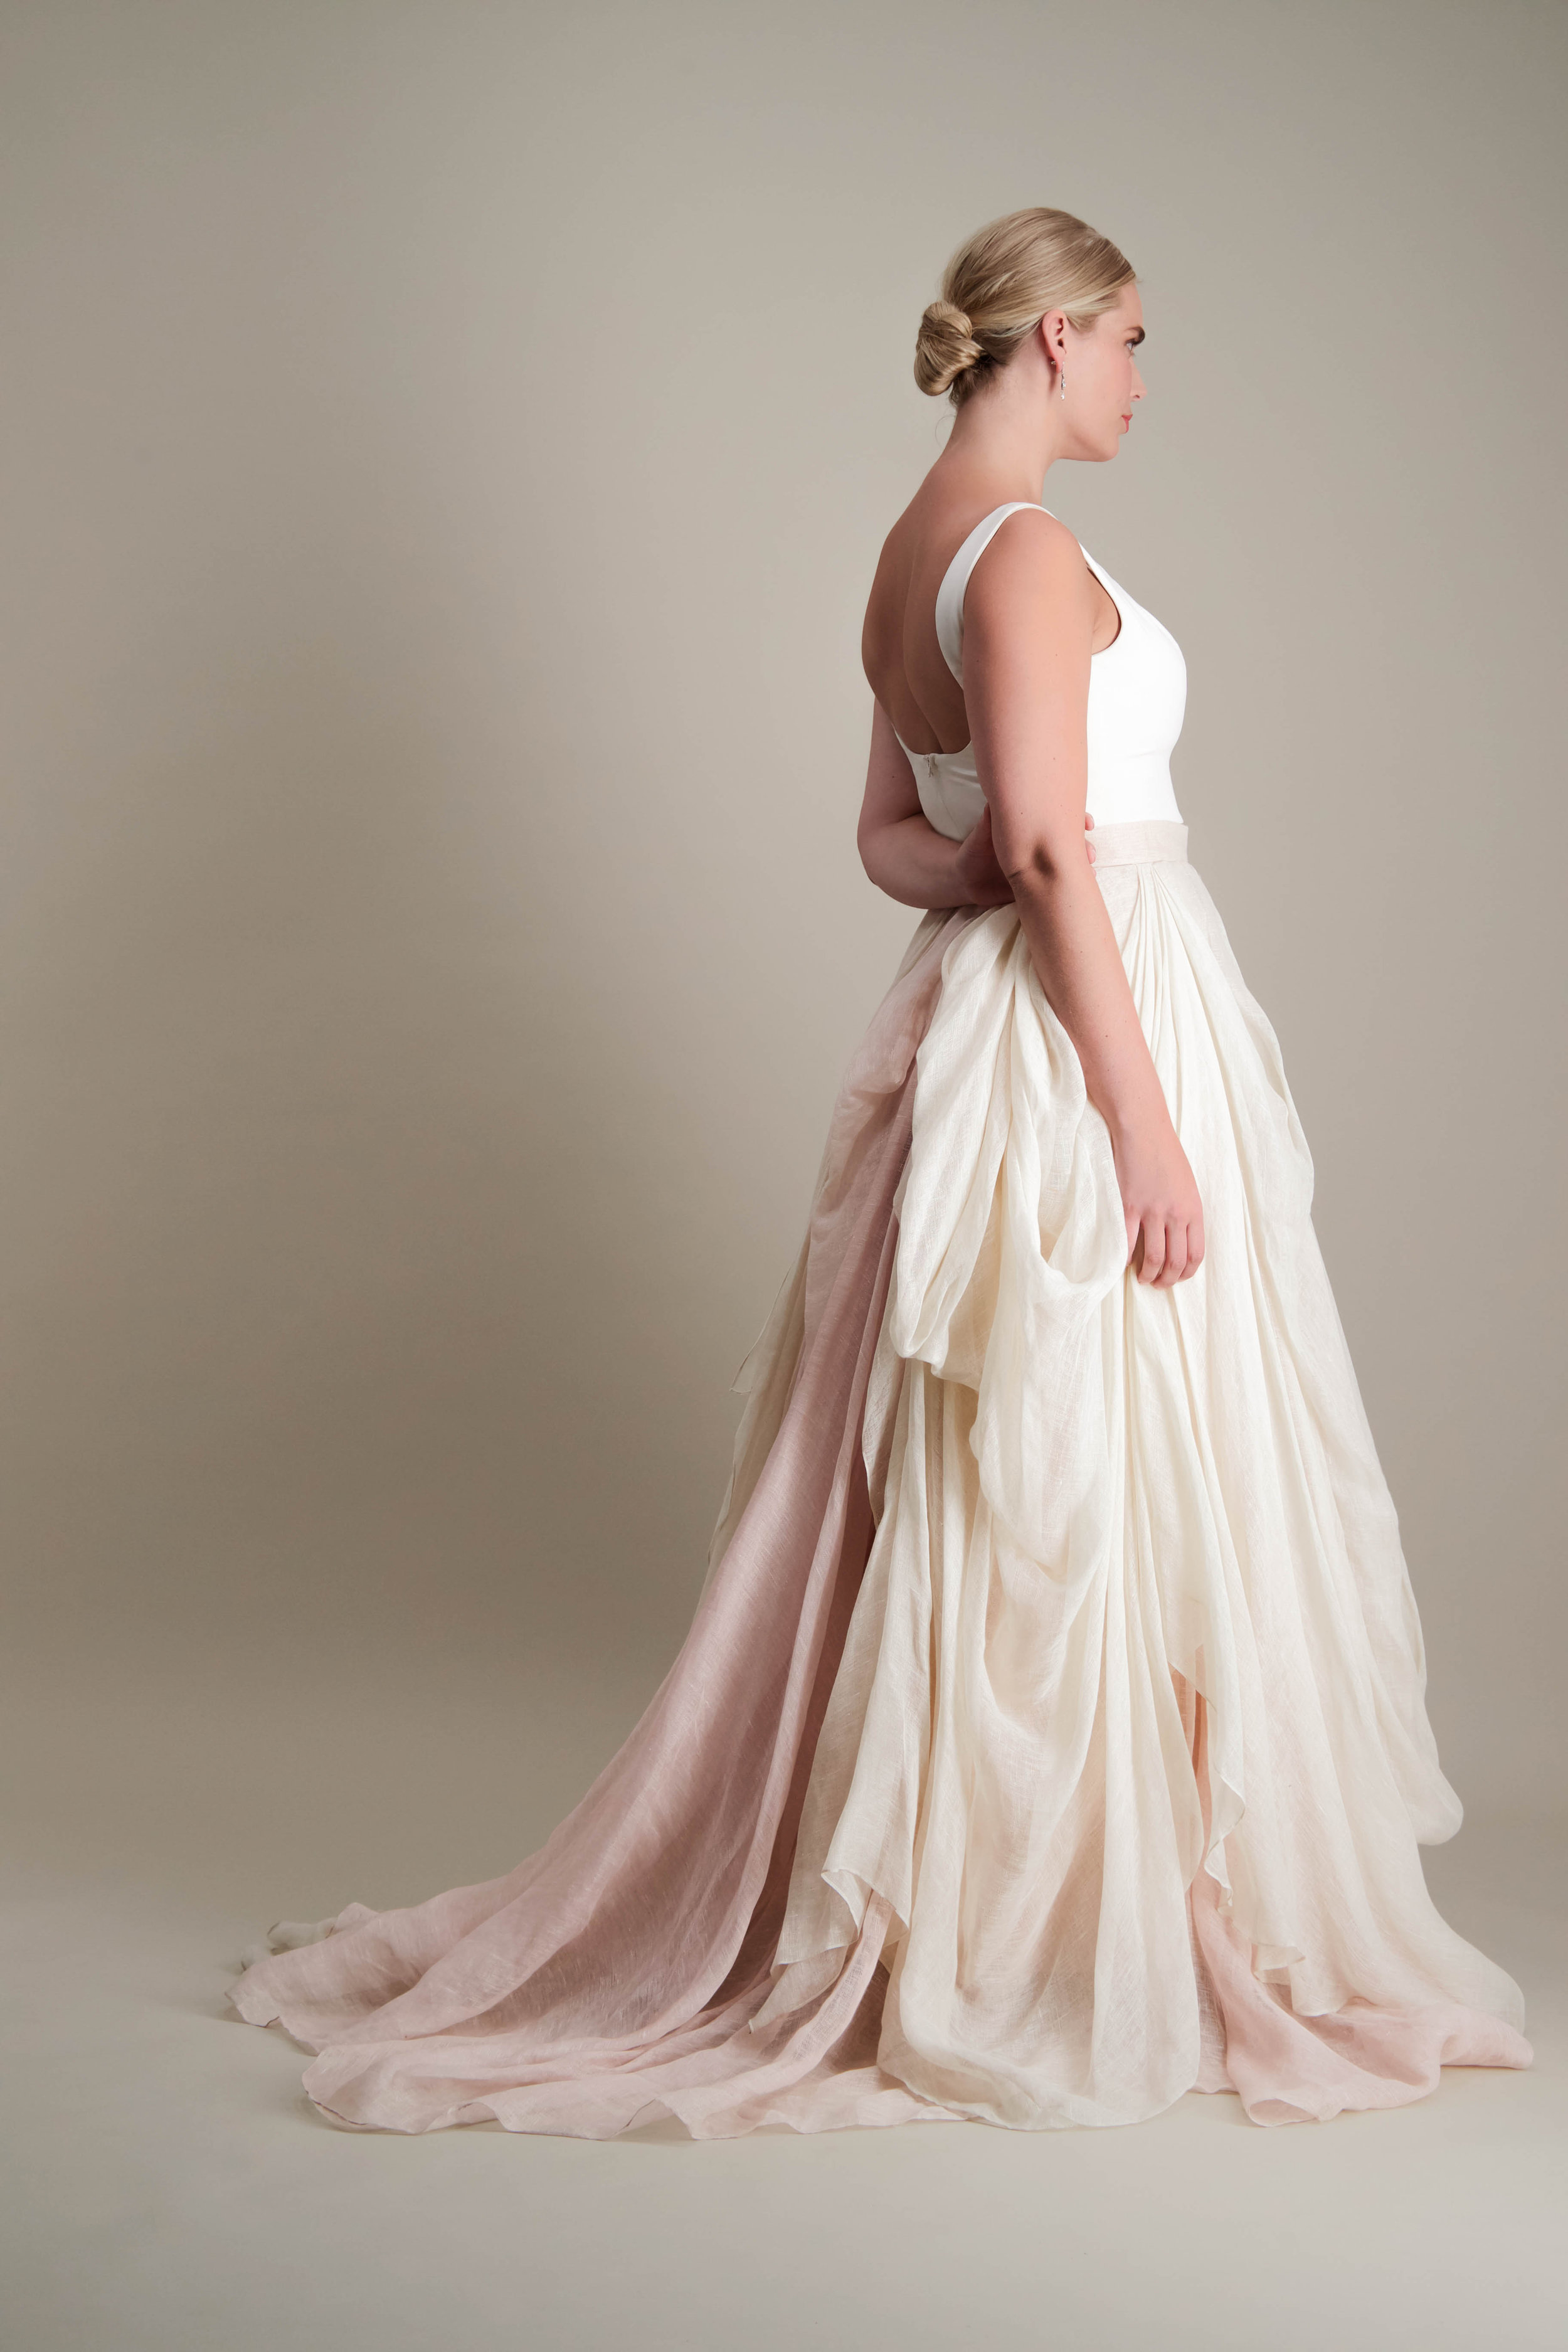 Kensington Skirt draped linen ball gown with scoop neck tank bodice 3.jpg